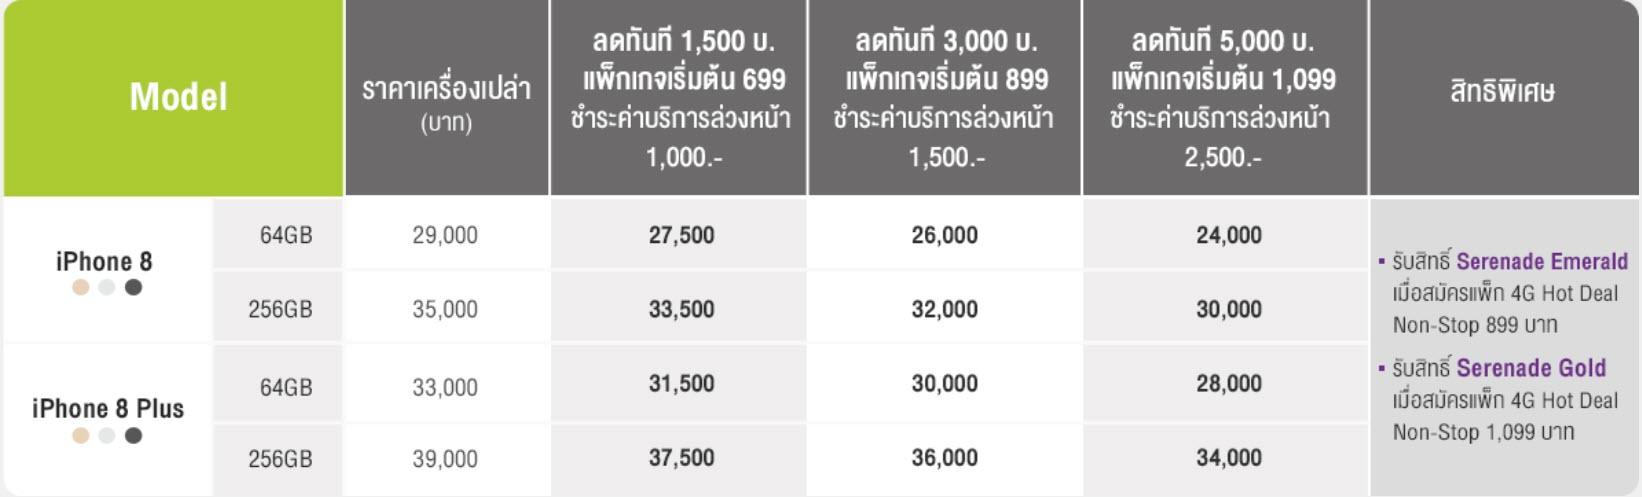 Iphone 8 Ais Pre Order Price